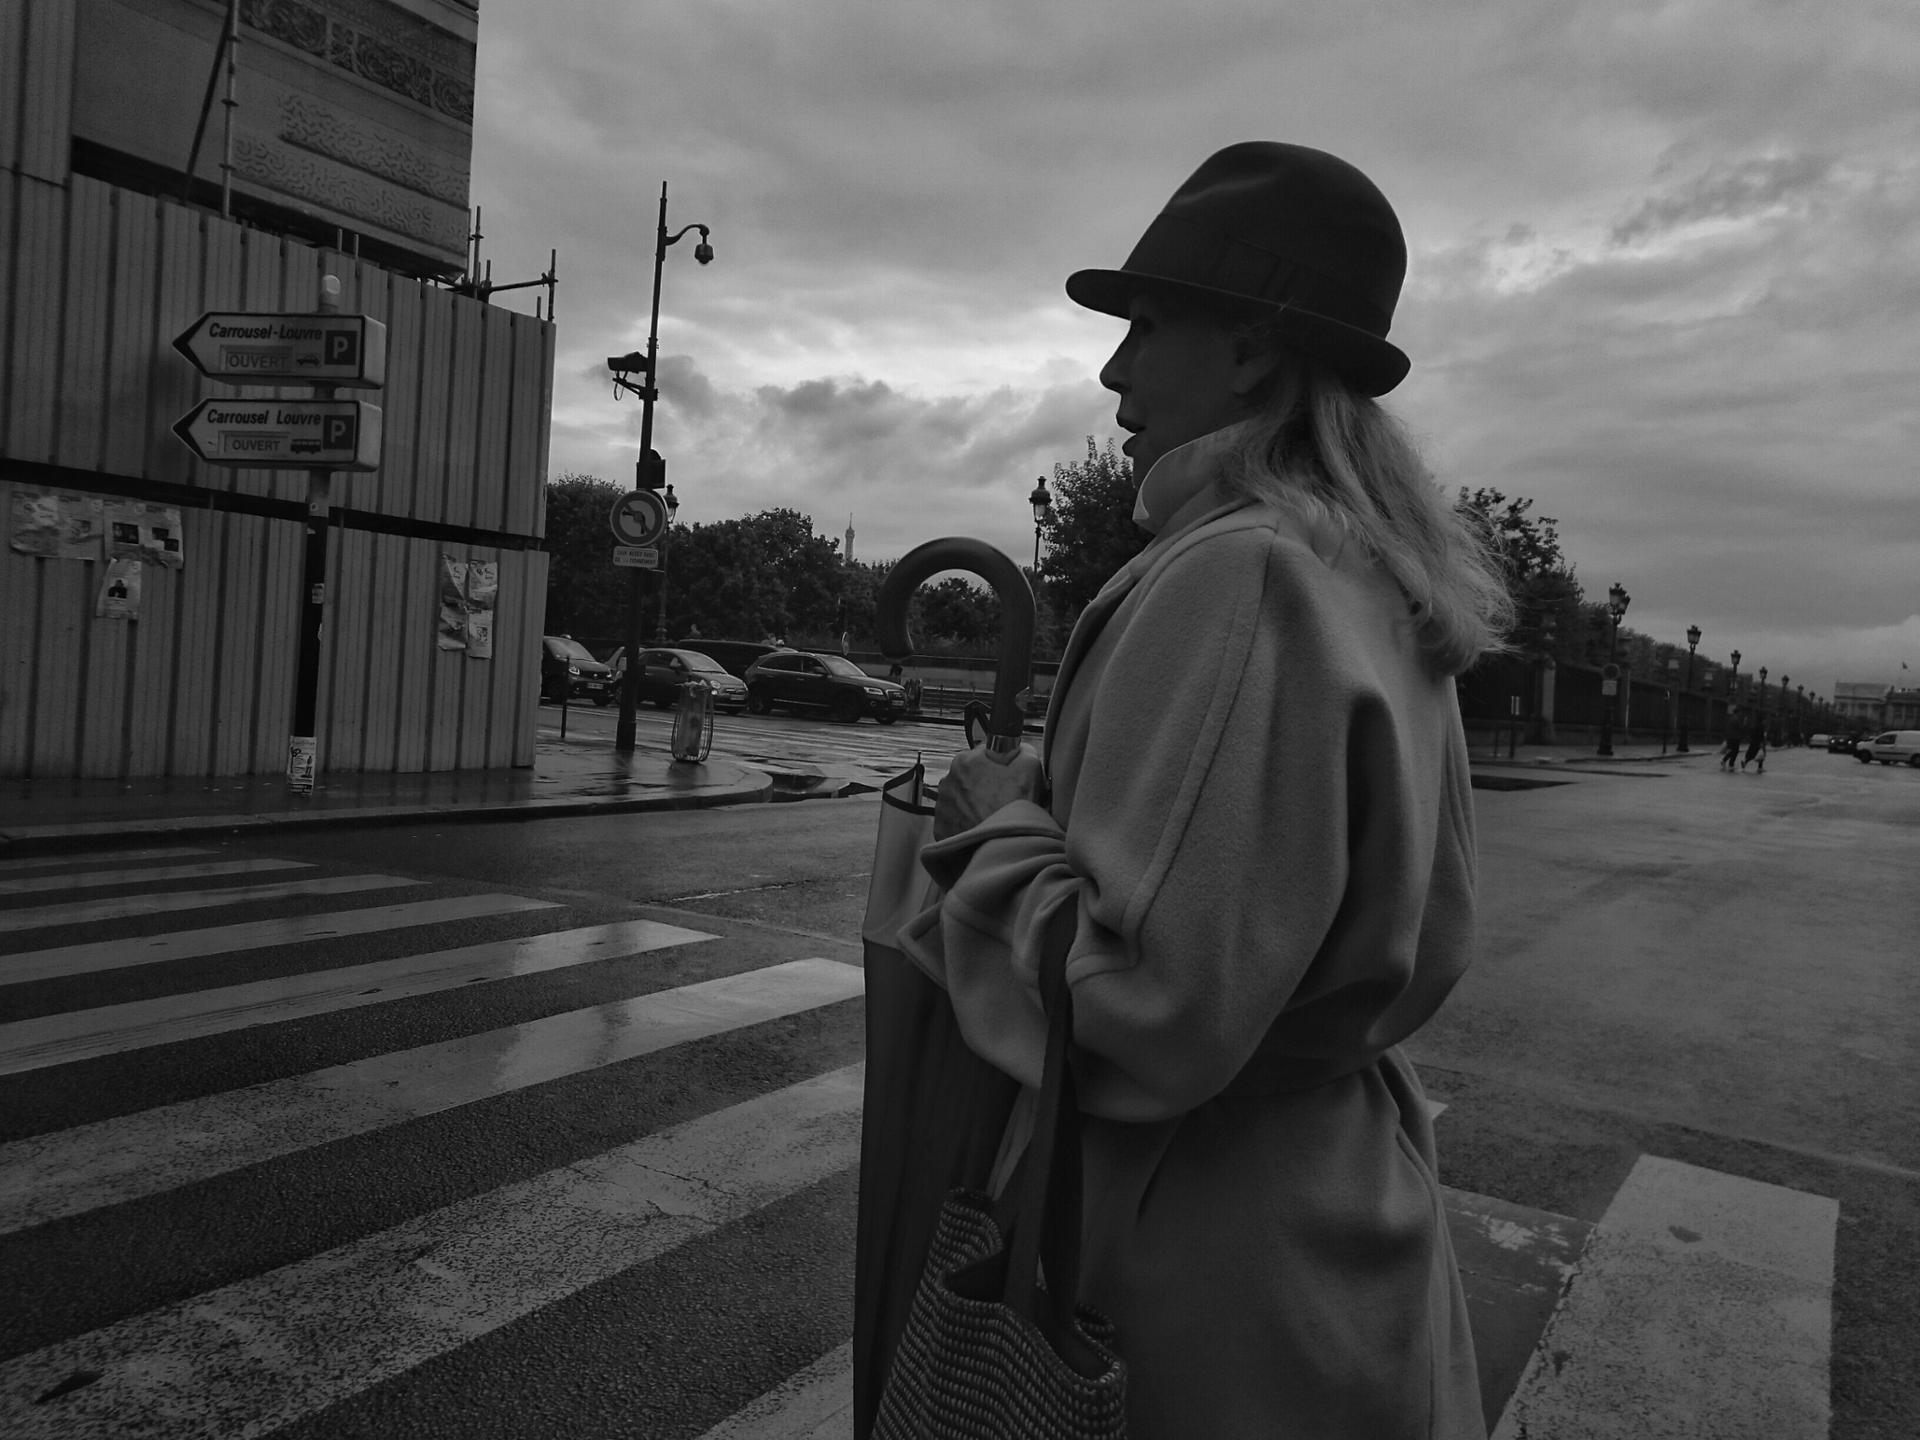 """APRES LA PLUIE... DIEU CREA LA PARISIENNE"" (rue de Rivoli, Paris 2015)"